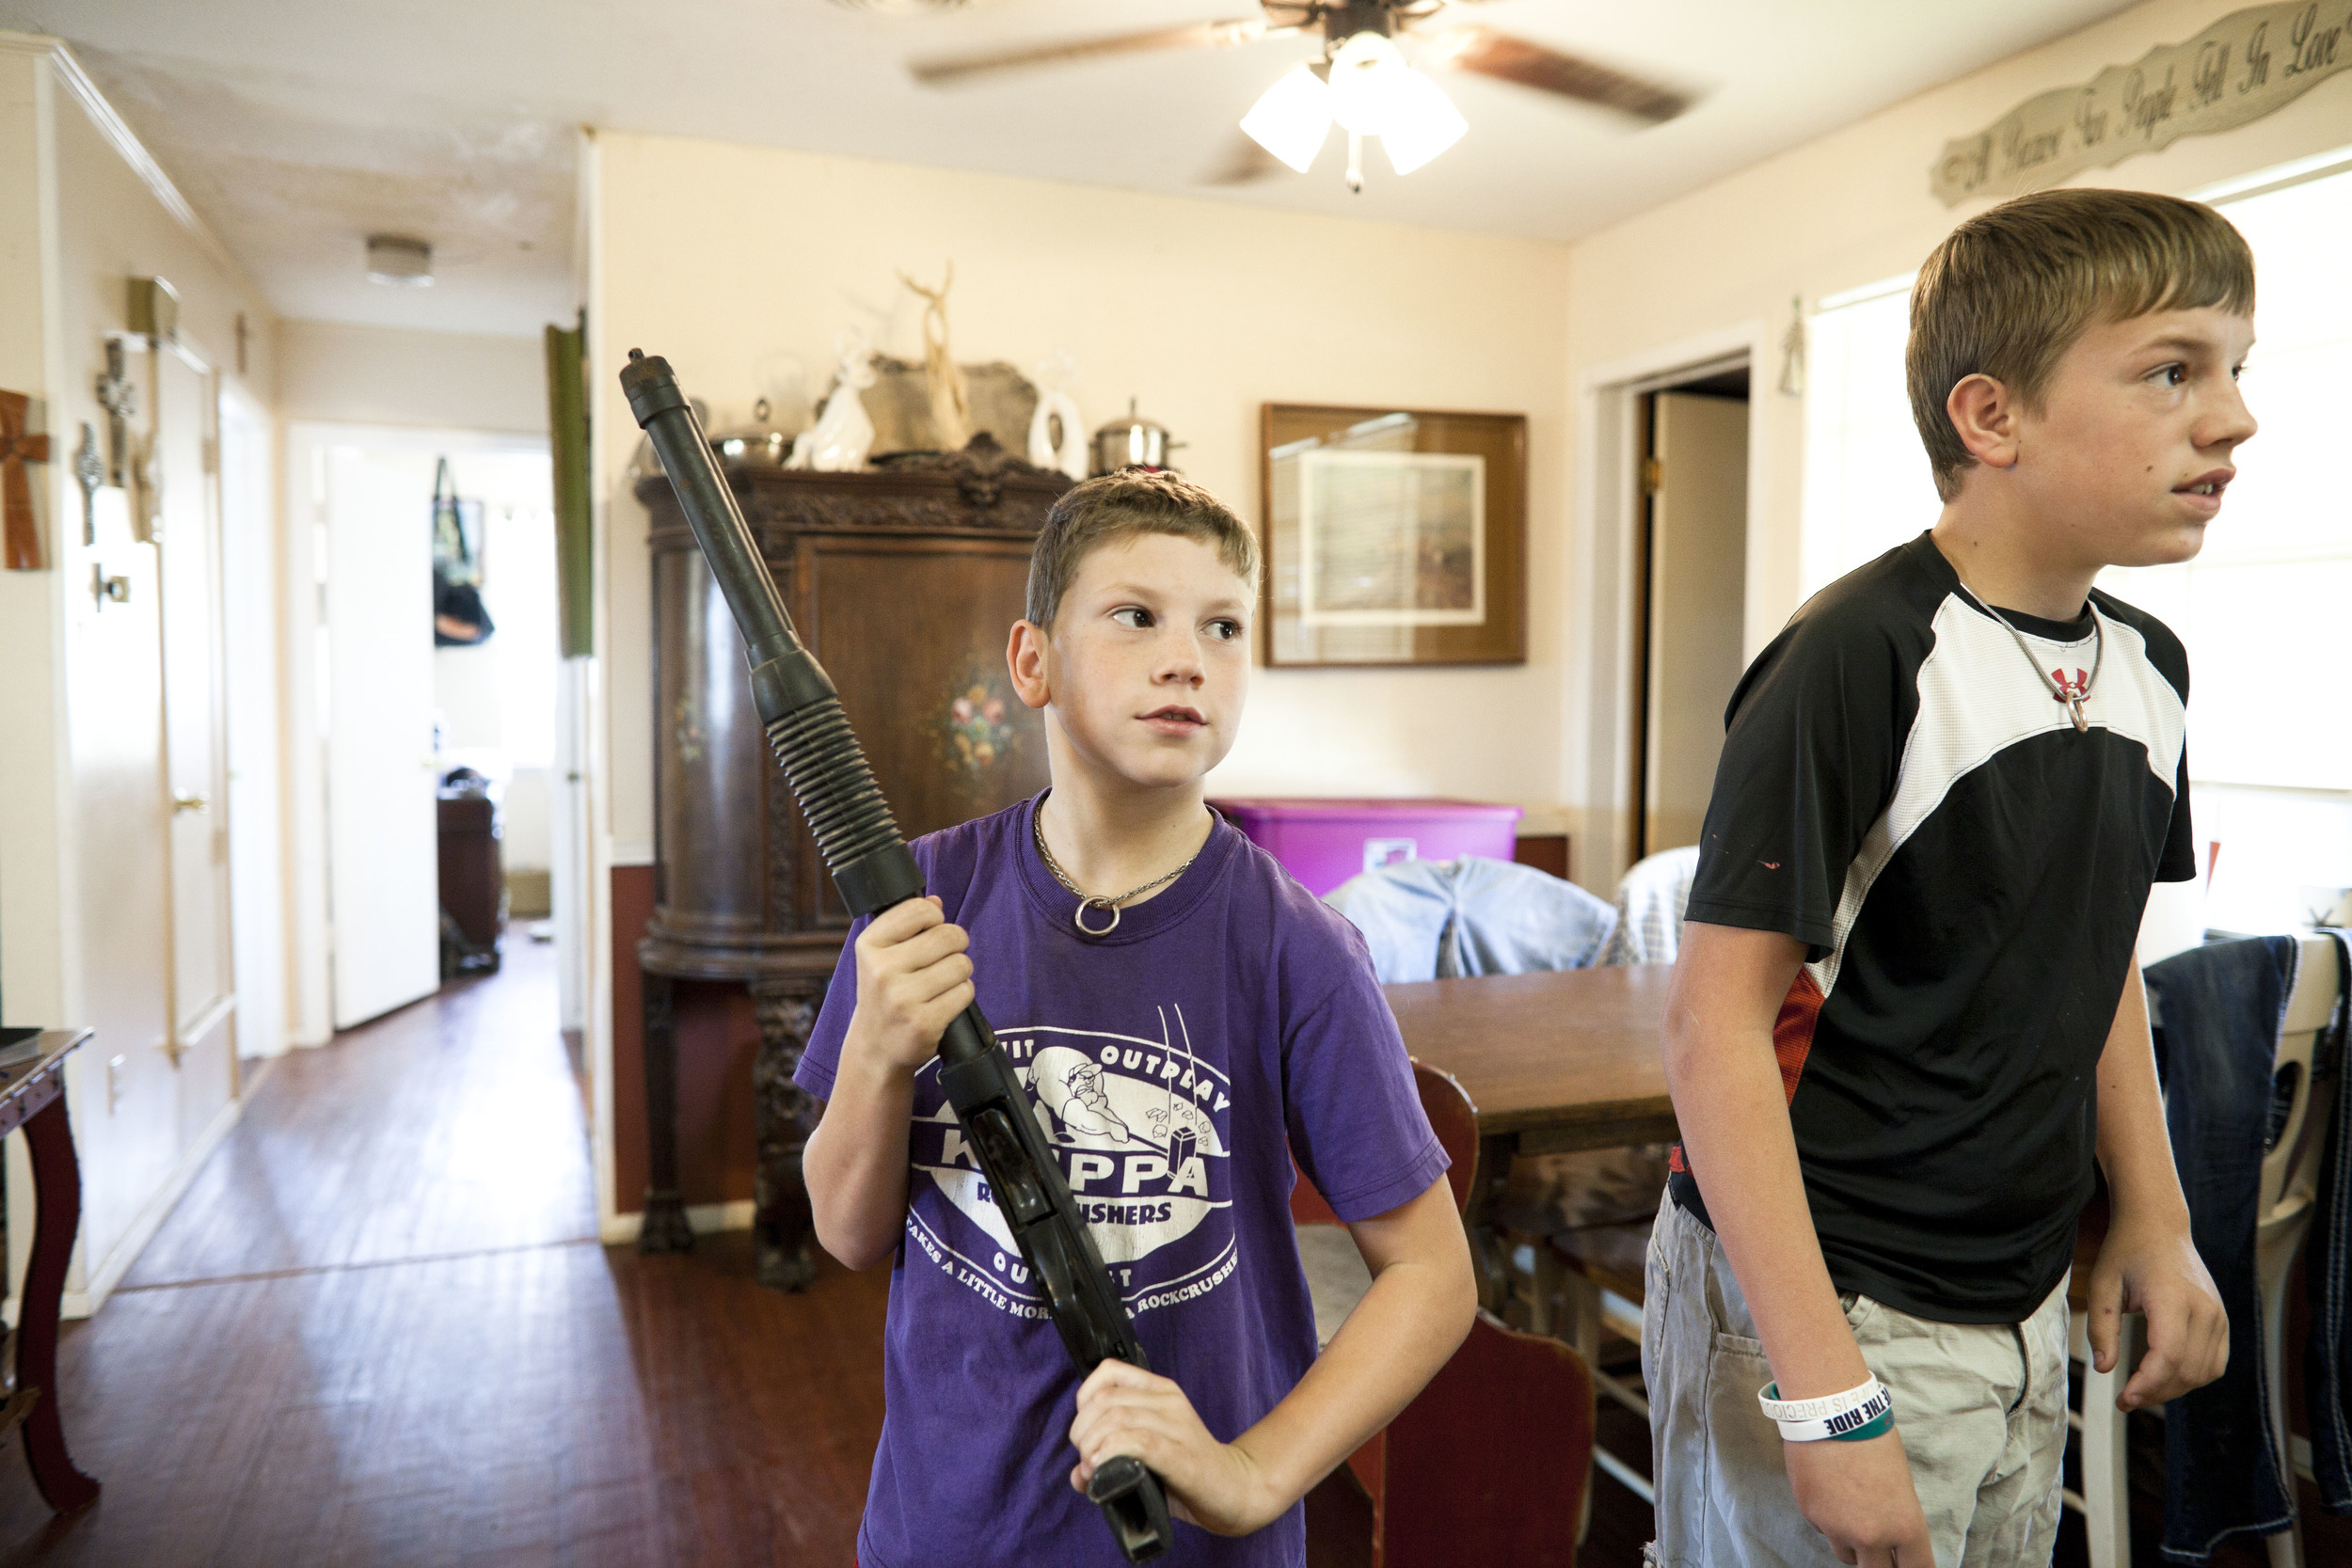 USA. Texas. Marfa. August 2013. 9-year-old Wyatt Kibbe presenting his rifle during breakfast.